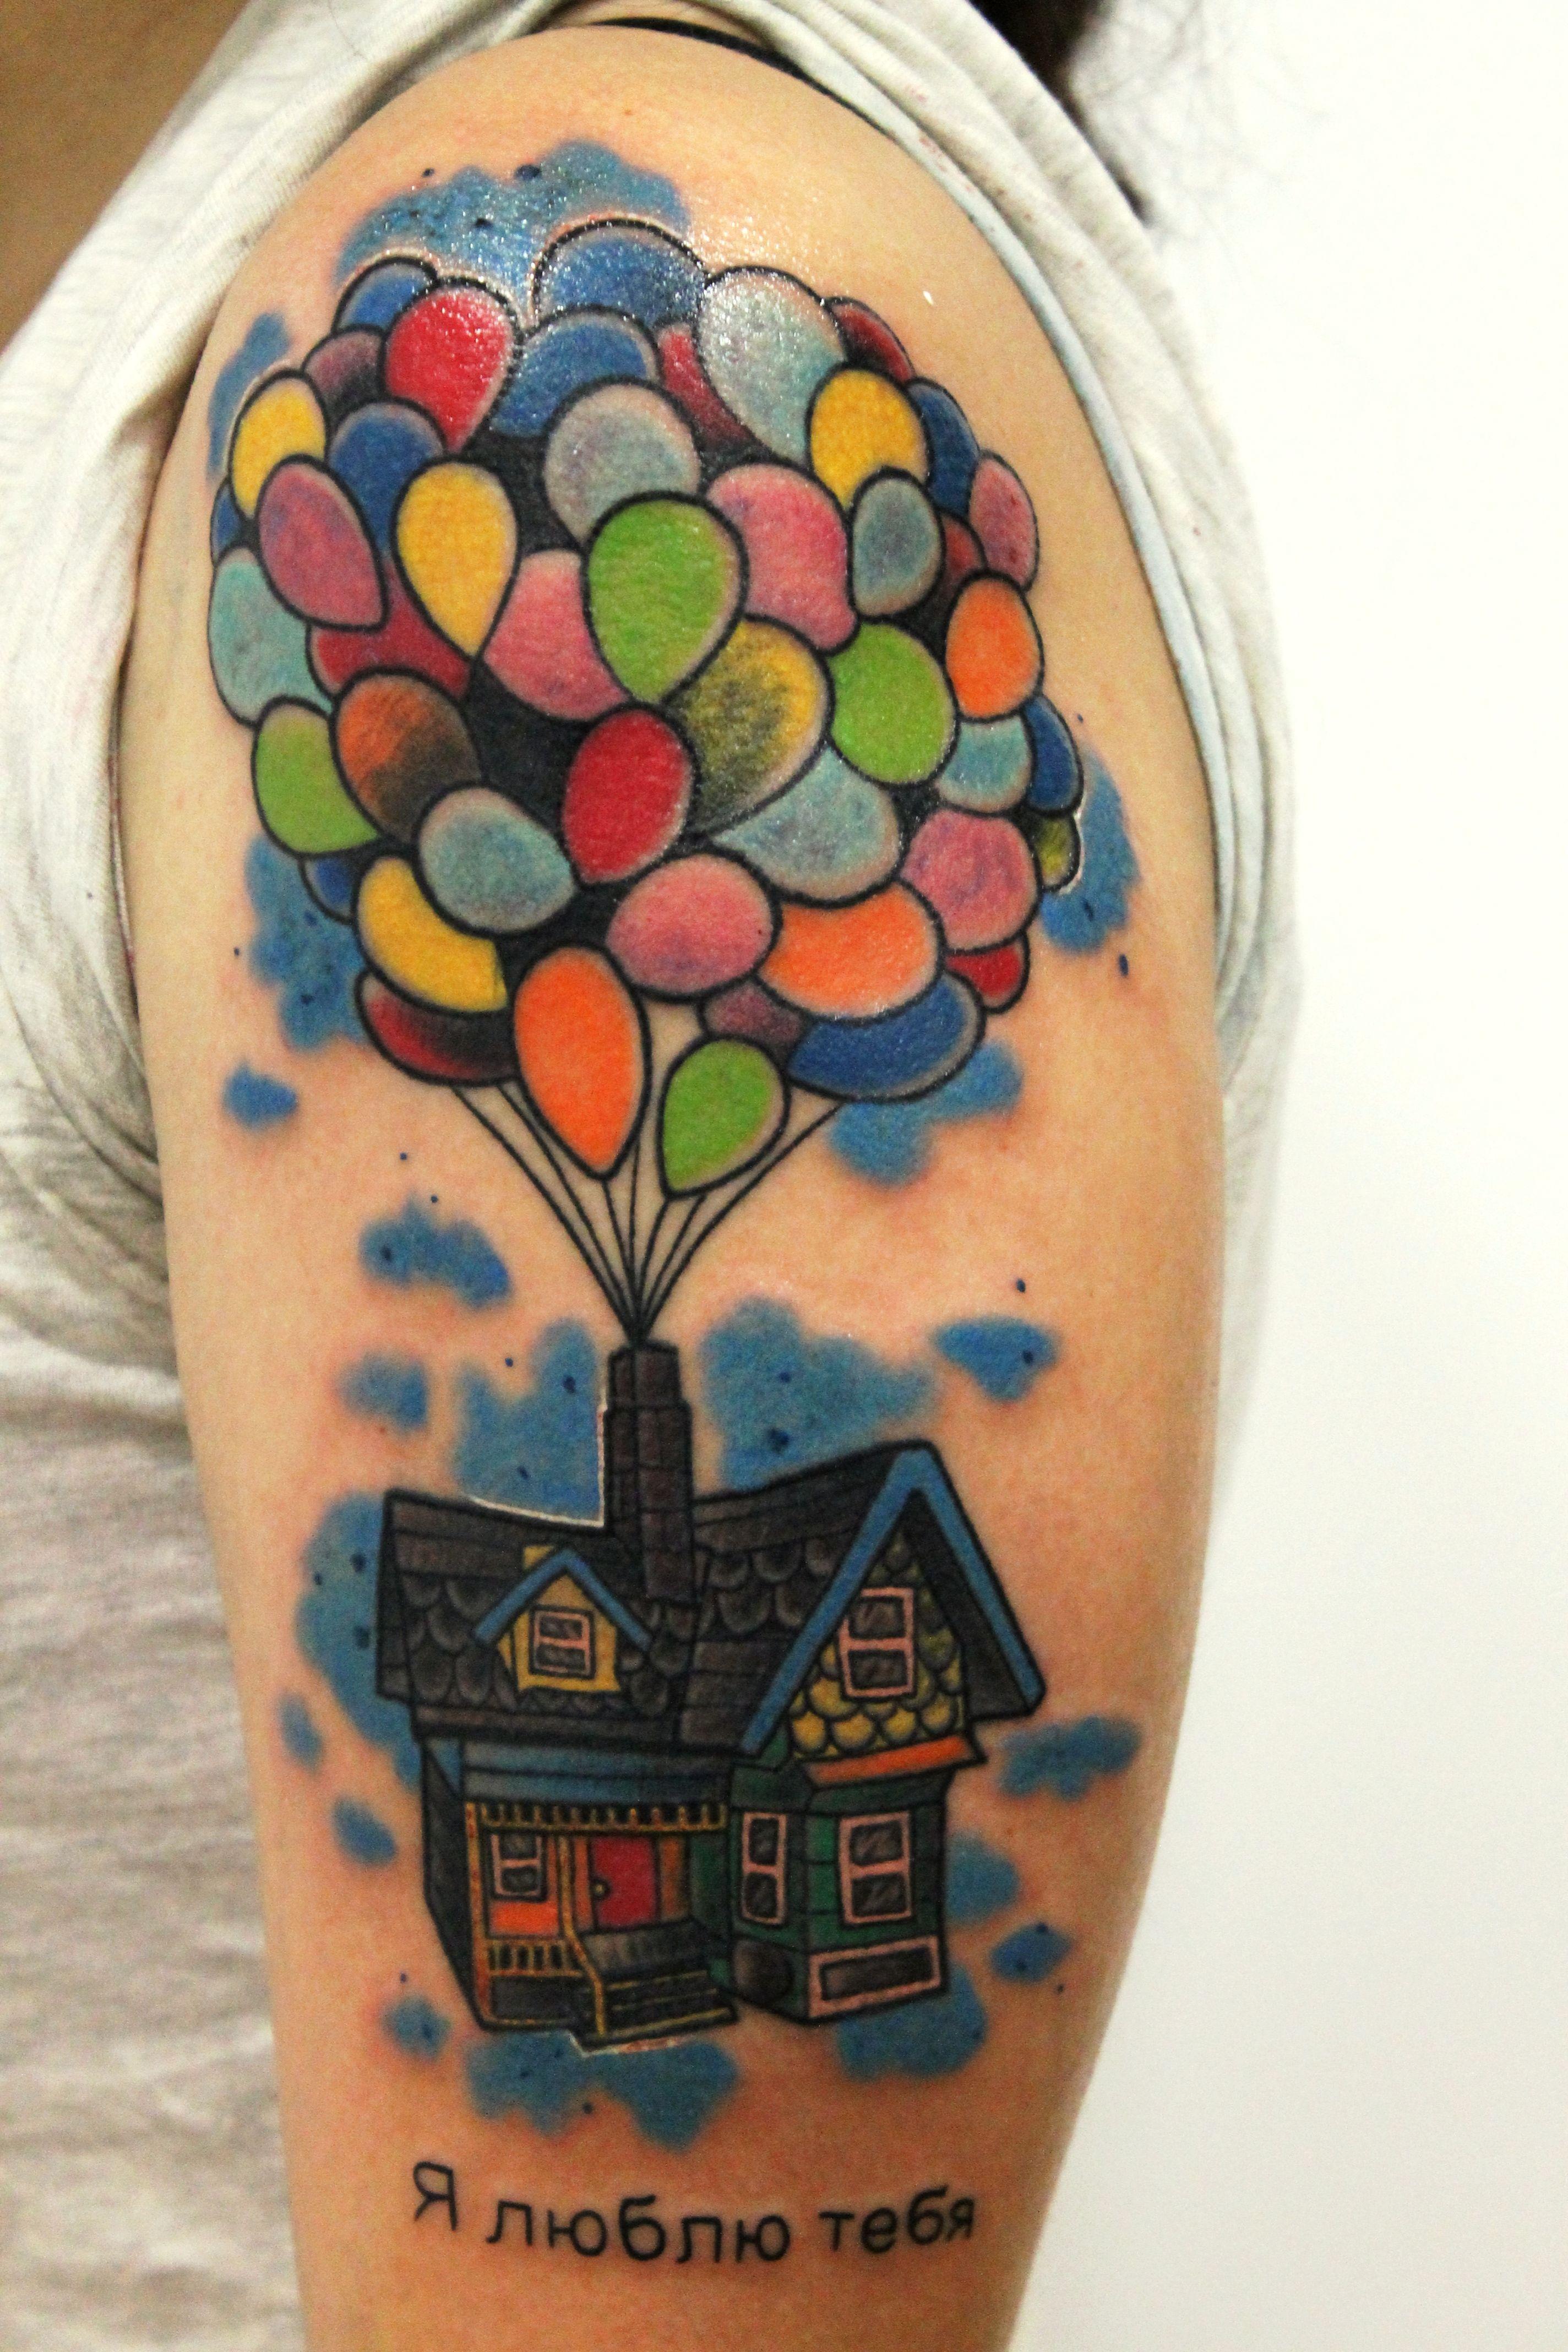 Casa De Up Pixar Animacion Tatuaje Estudiotatuajesgetafe